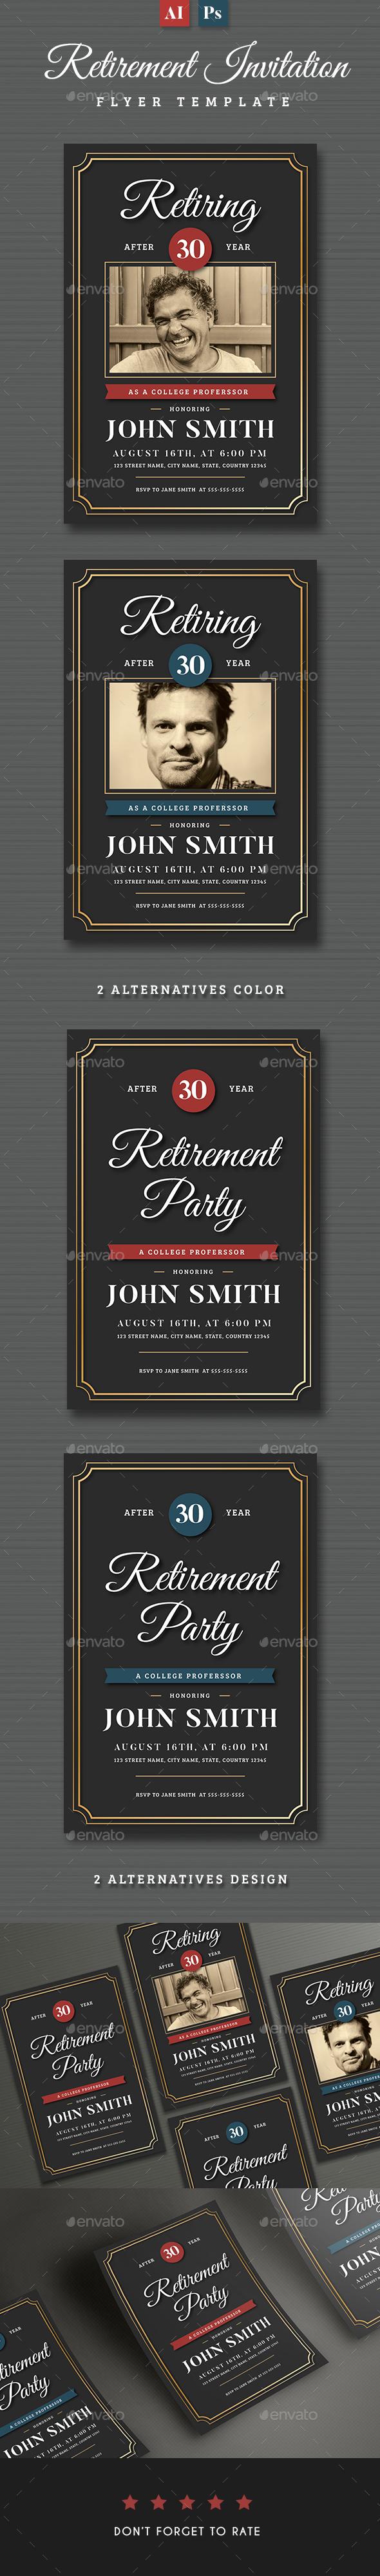 Retirement Invitation Flyer Templates - Invitations Cards & Invites